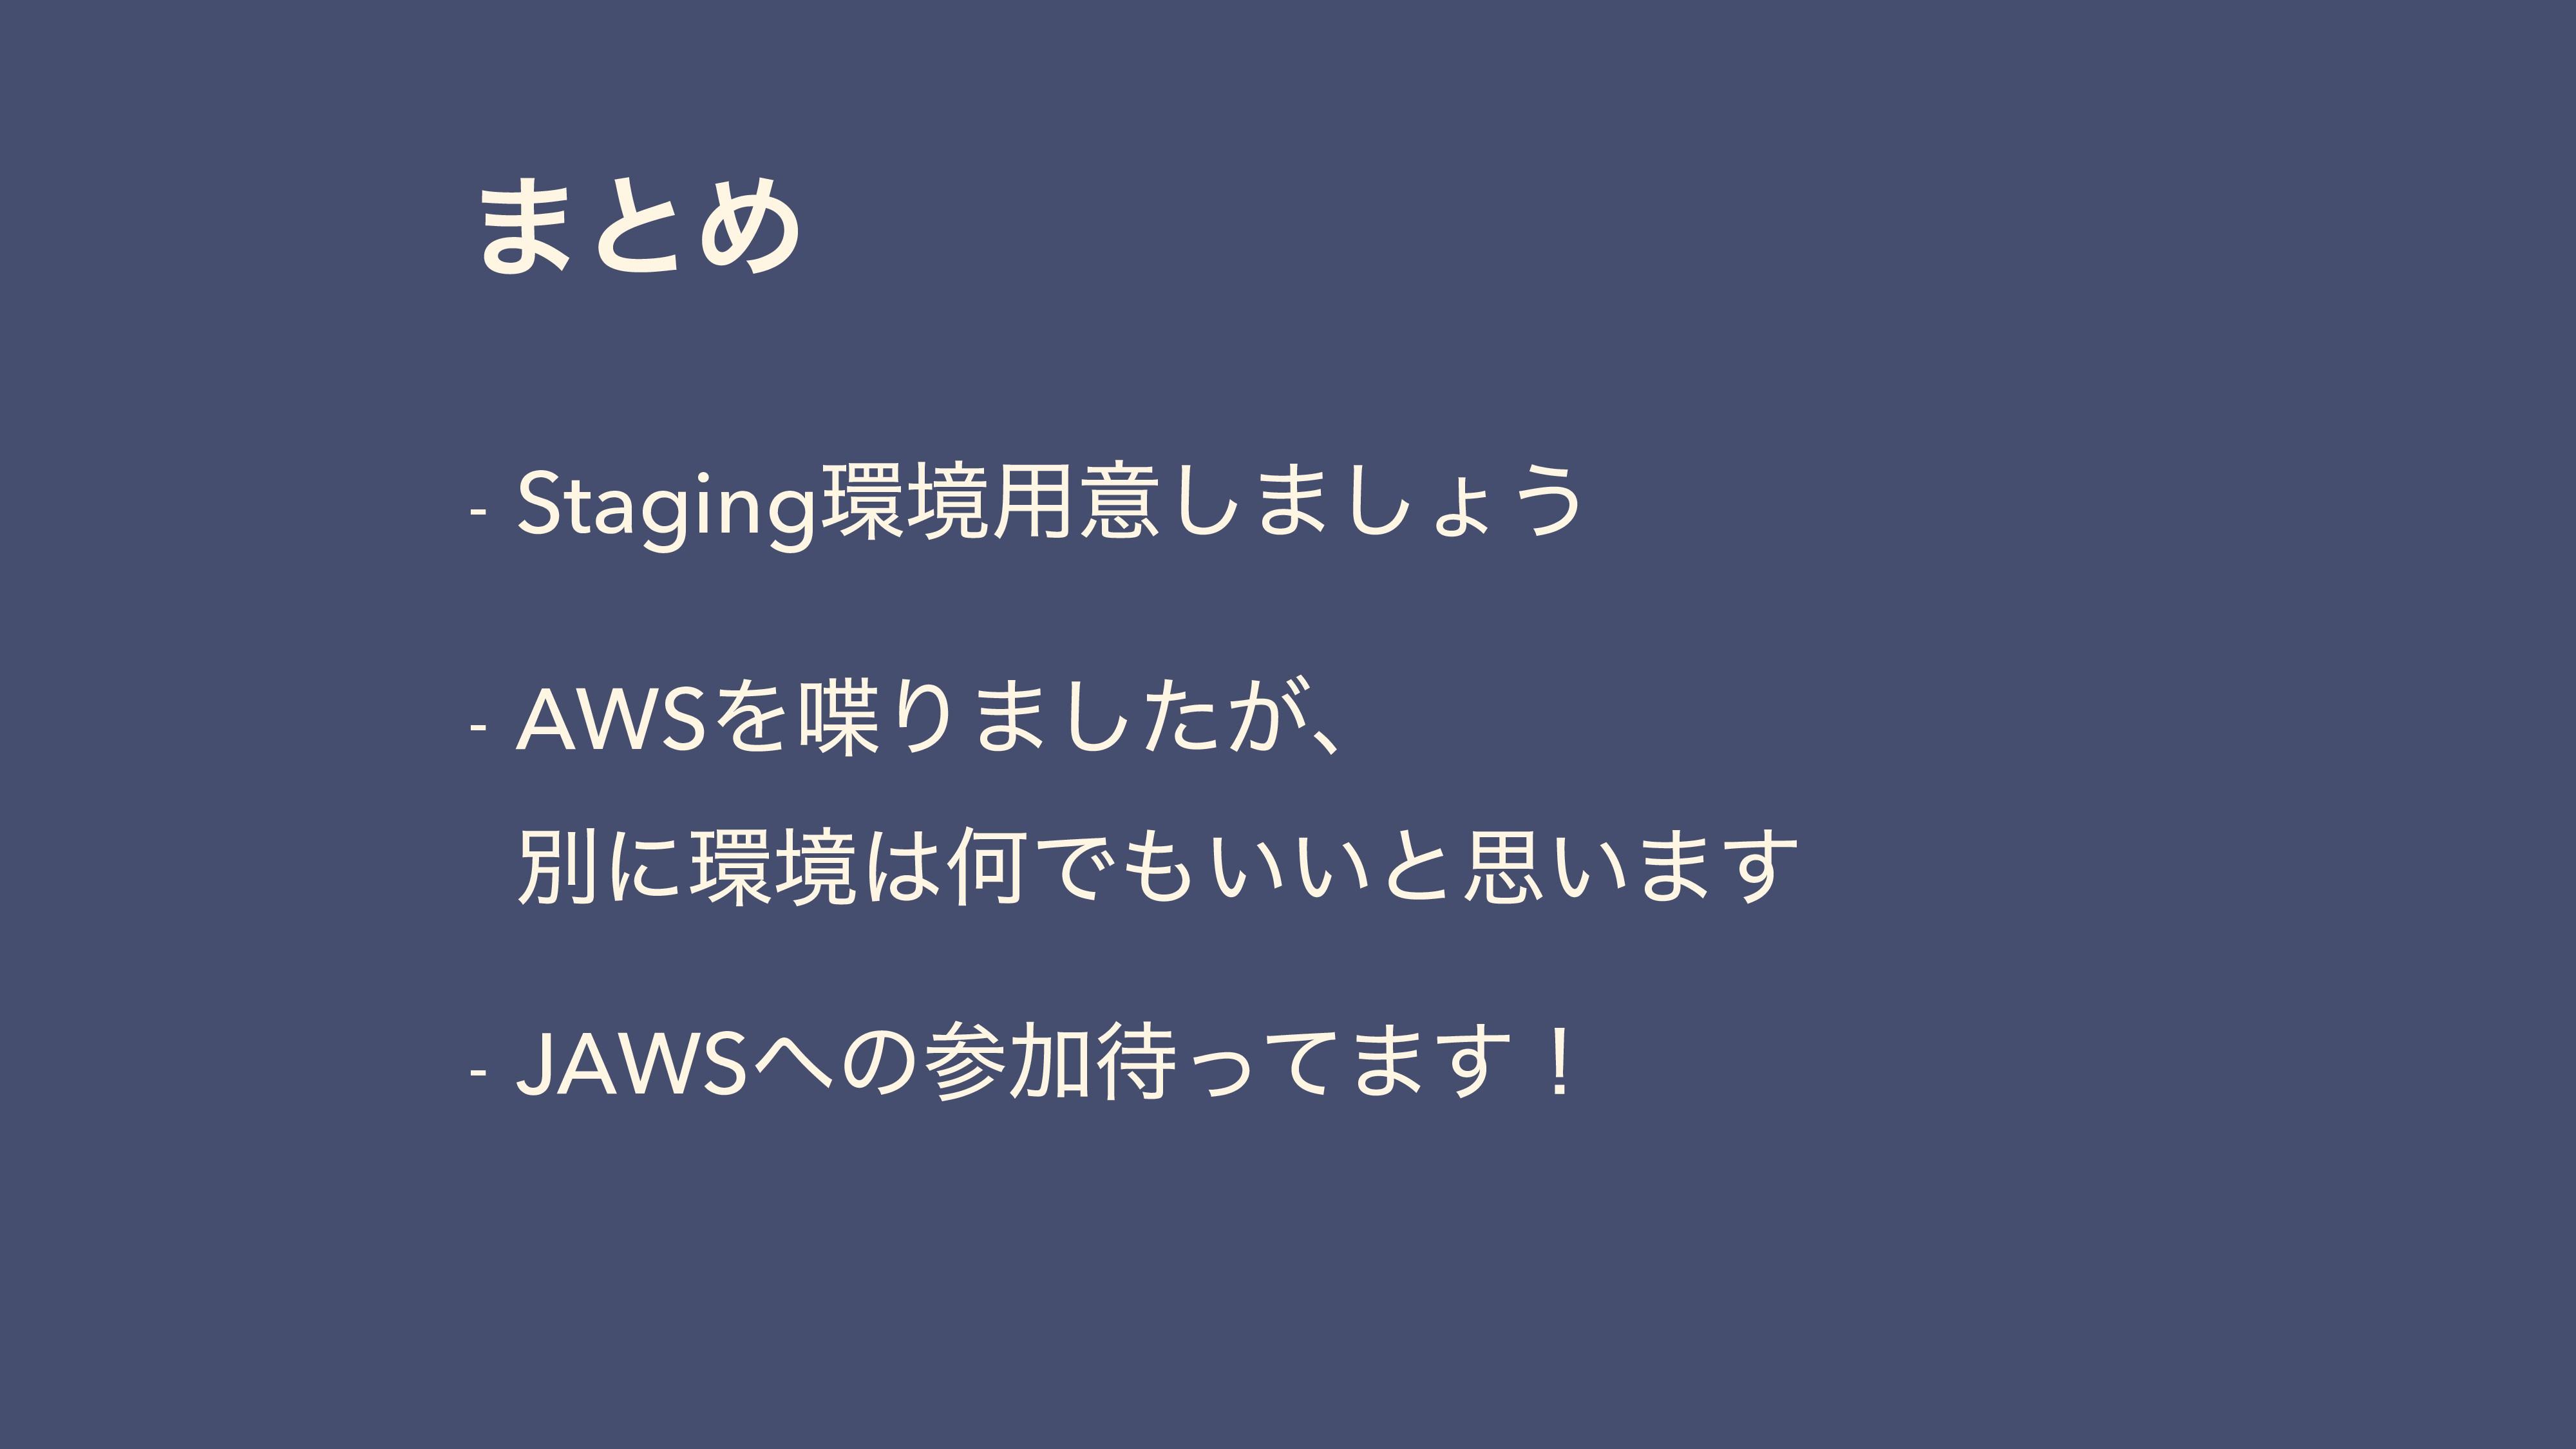 ·ͱΊ - Stagingڥ༻ҙ͠·͠ΐ͏ - AWSΛΓ·͕ͨ͠ɺ ผʹڥԿͰ͍...